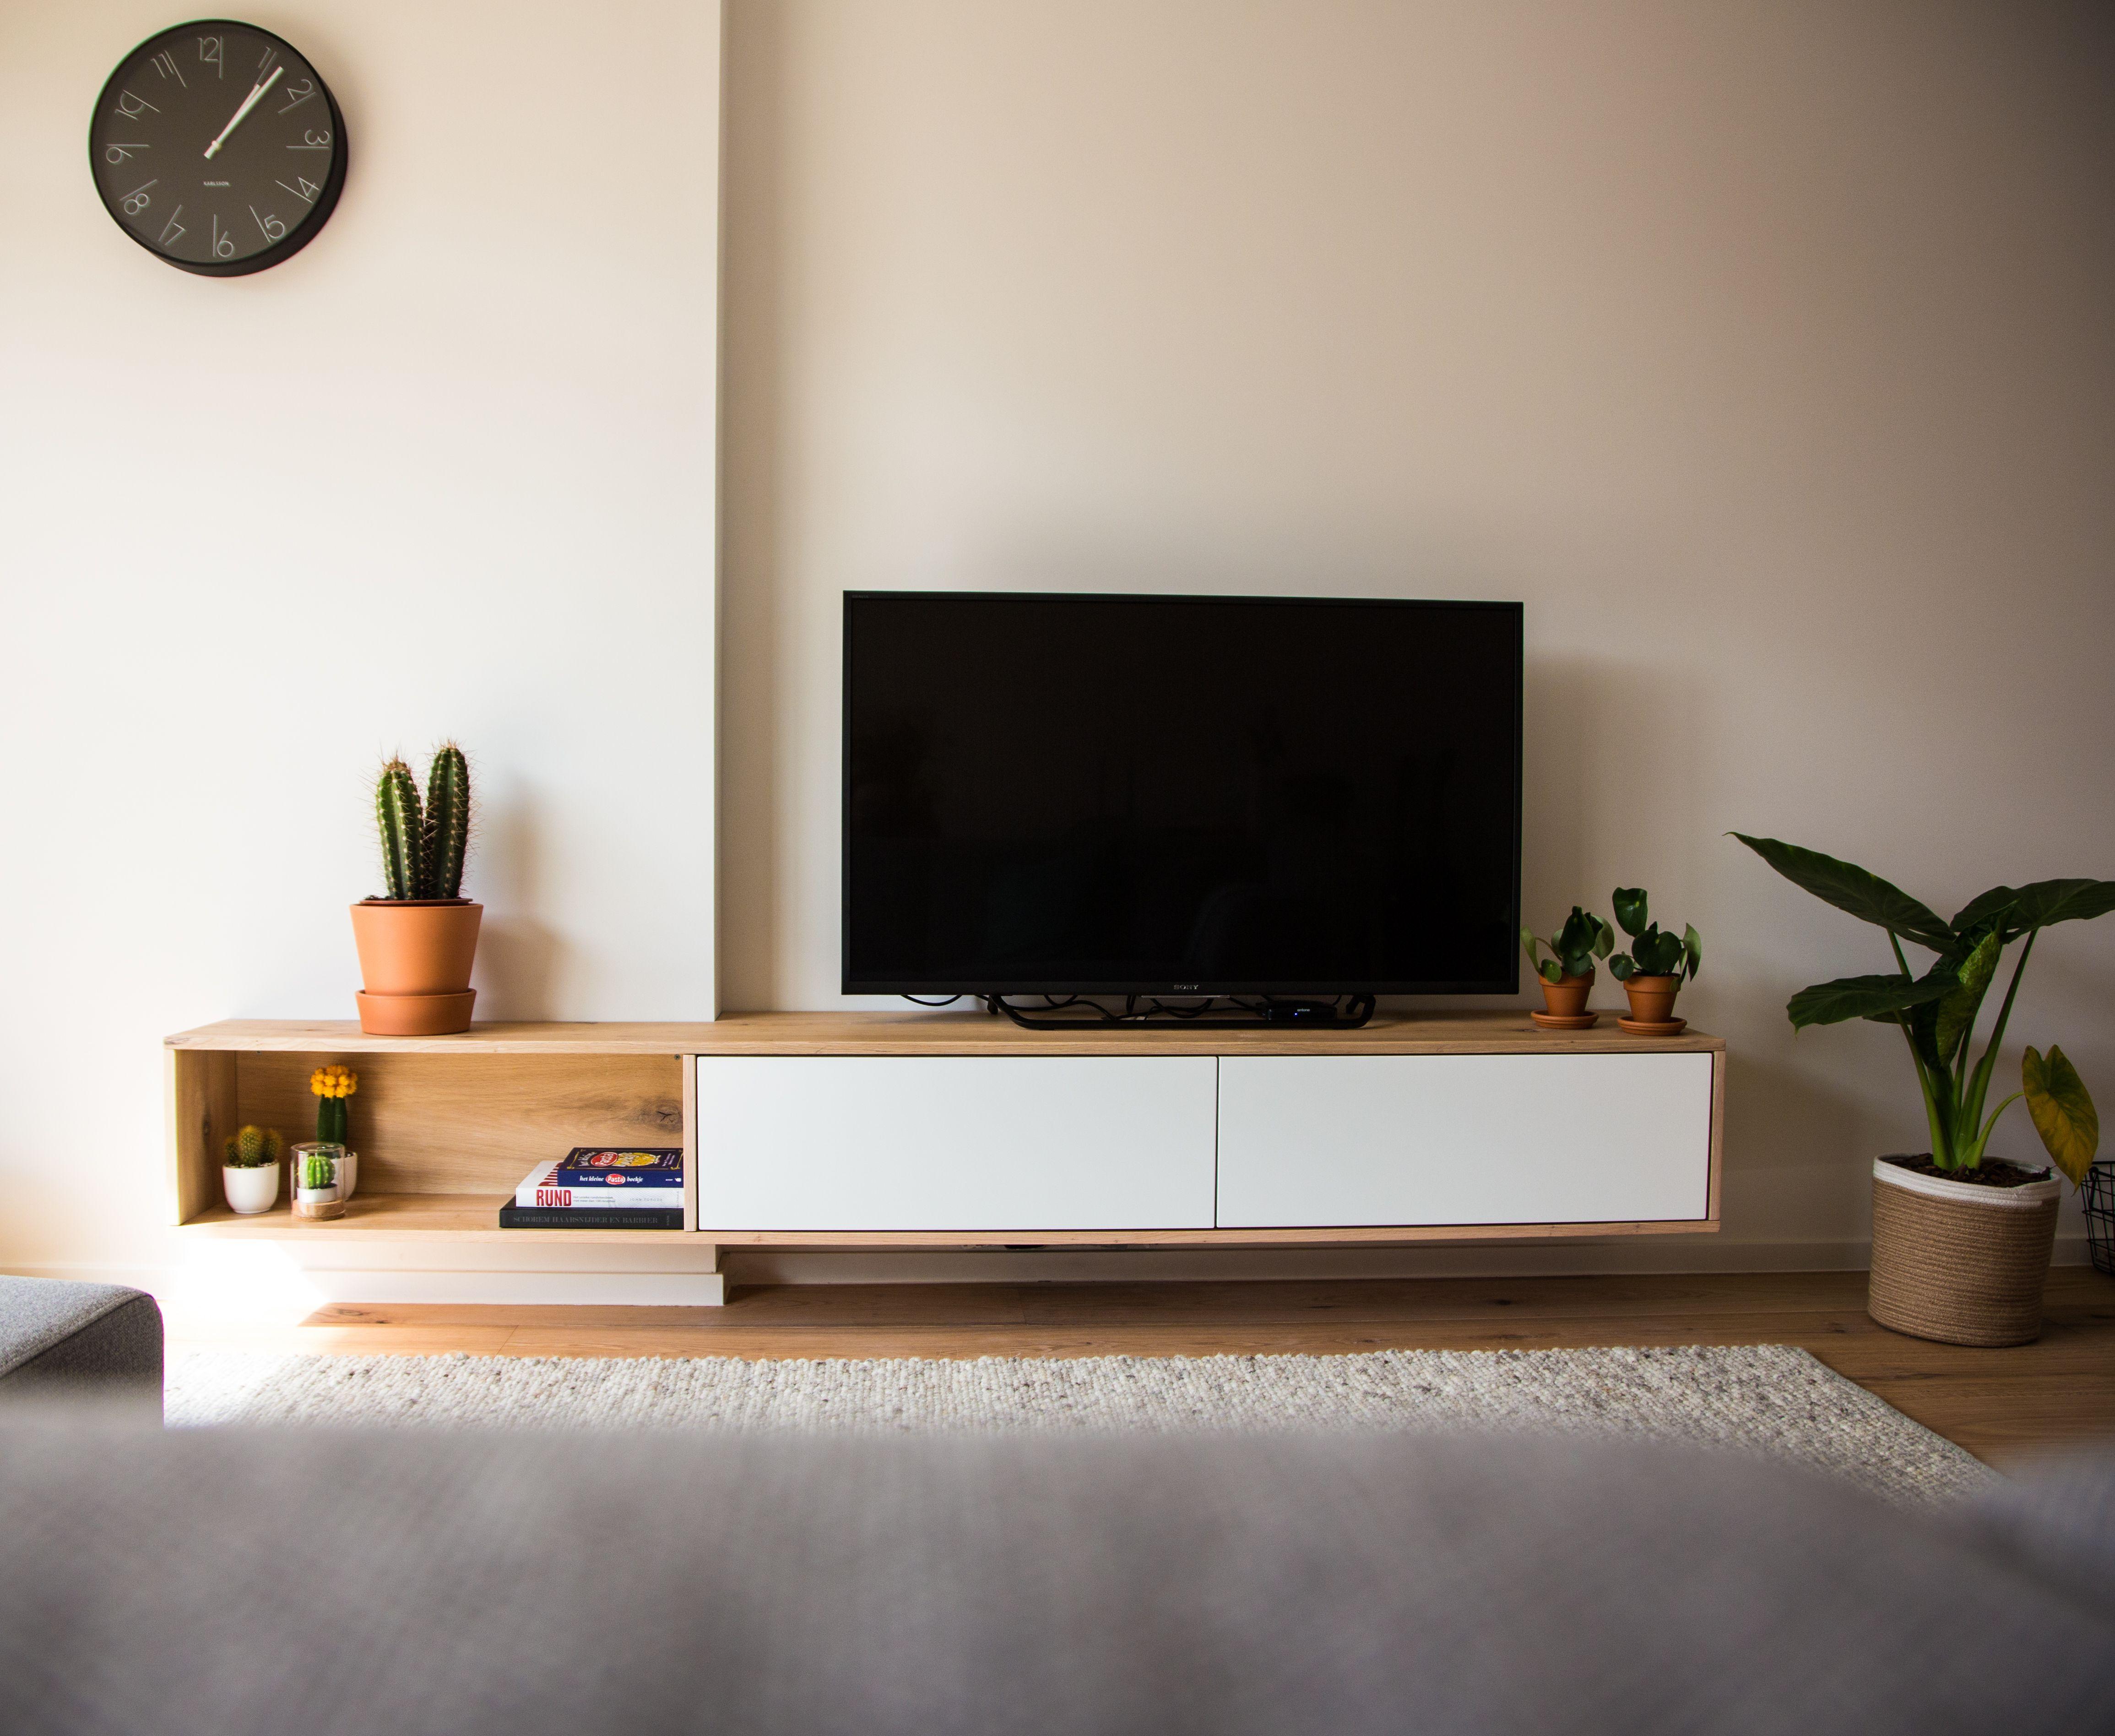 Berka Projects Zwevend Tv Meubel Eiken Wit Furniture In